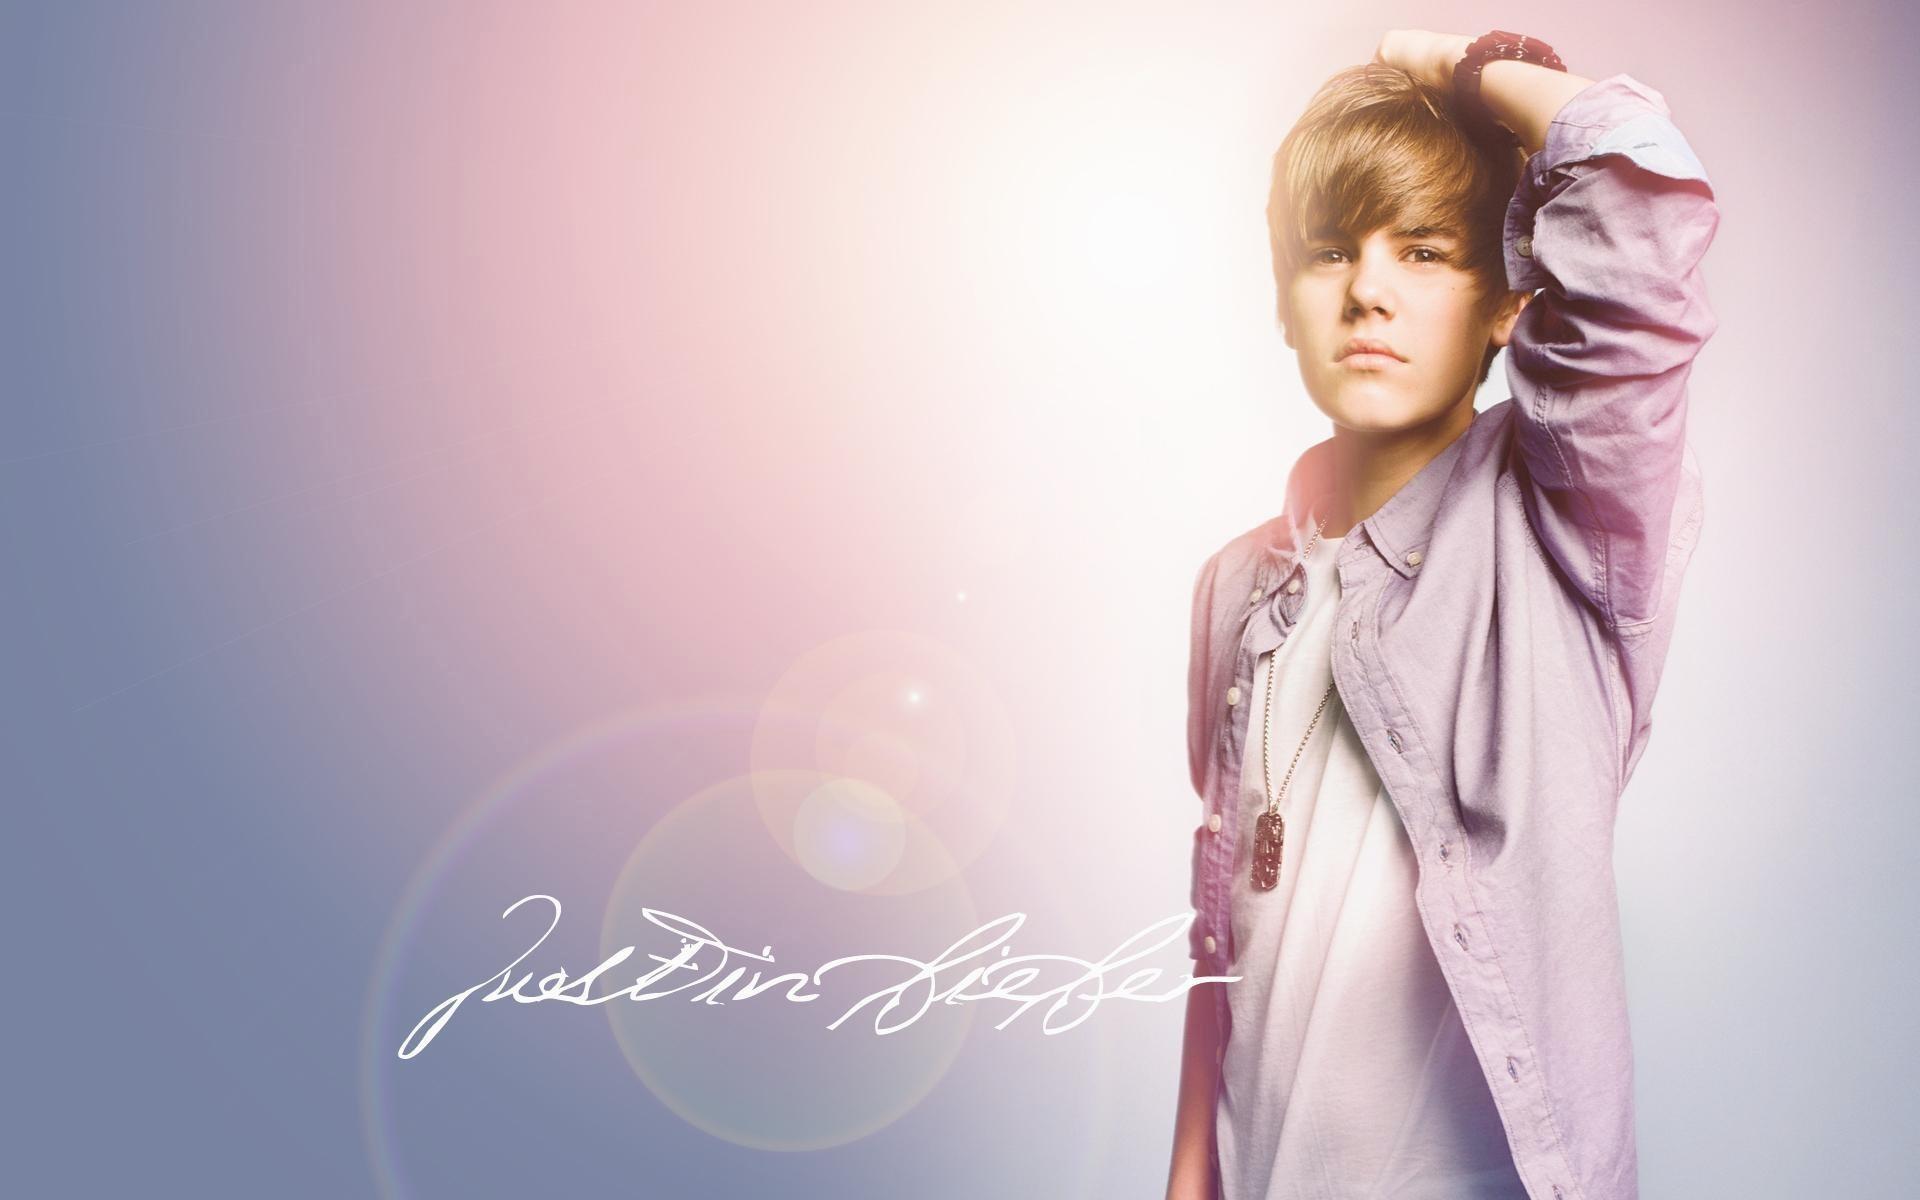 Justin Bieber Tumblr Backgrounds 2018 (67+ Images